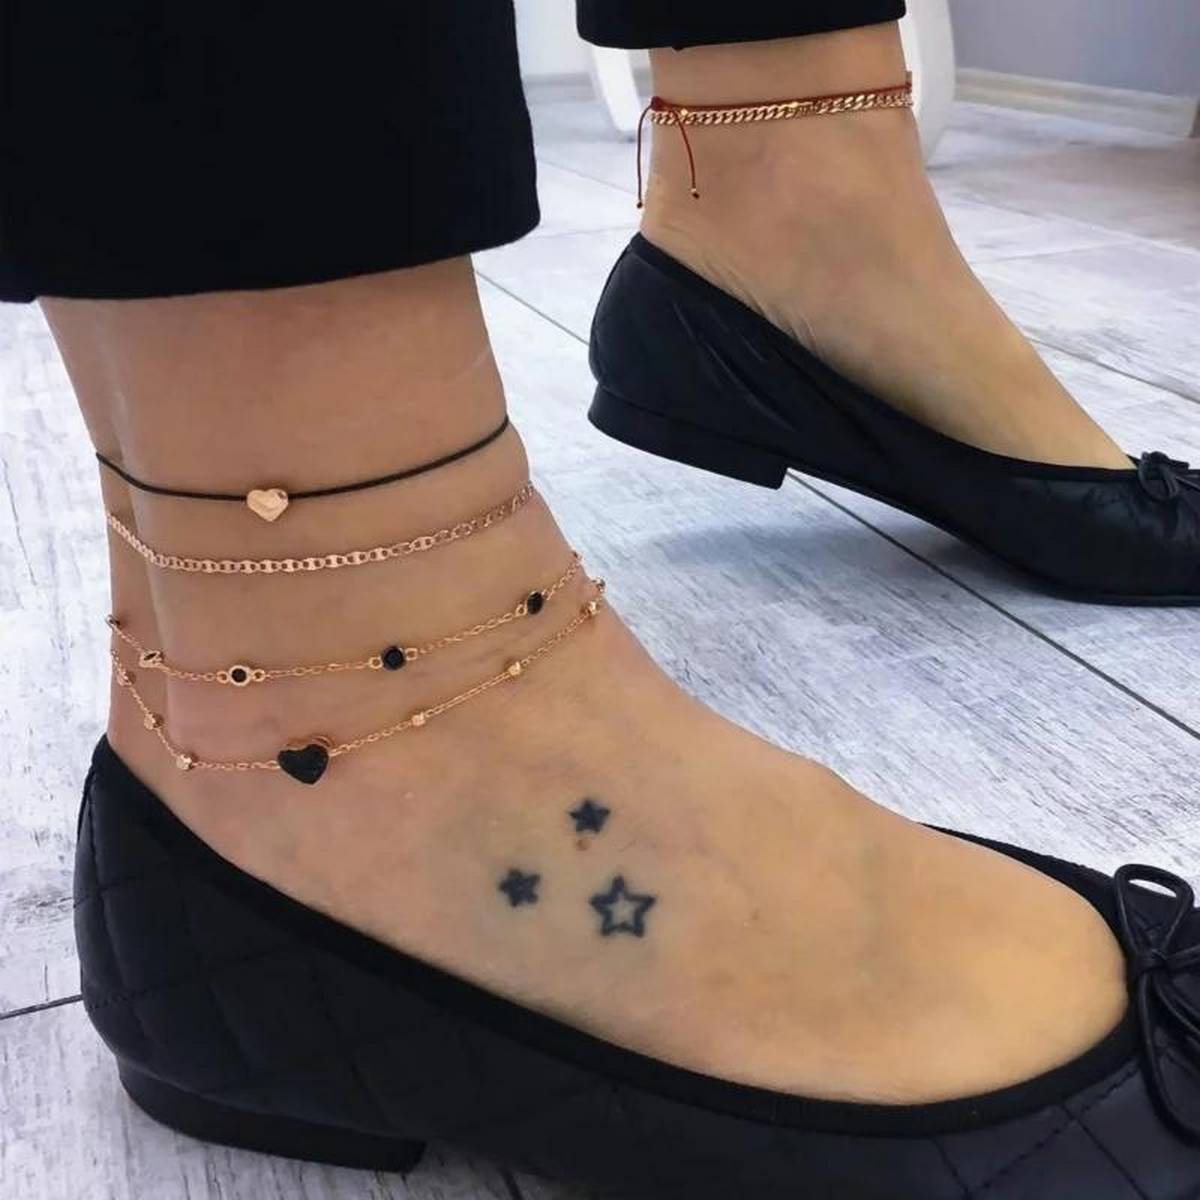 Anklet Fashion or Arm Bracelet cobo Fashion - 4 Layers Bracelet or Anklets - Women Fashion wear - Girls Fashion